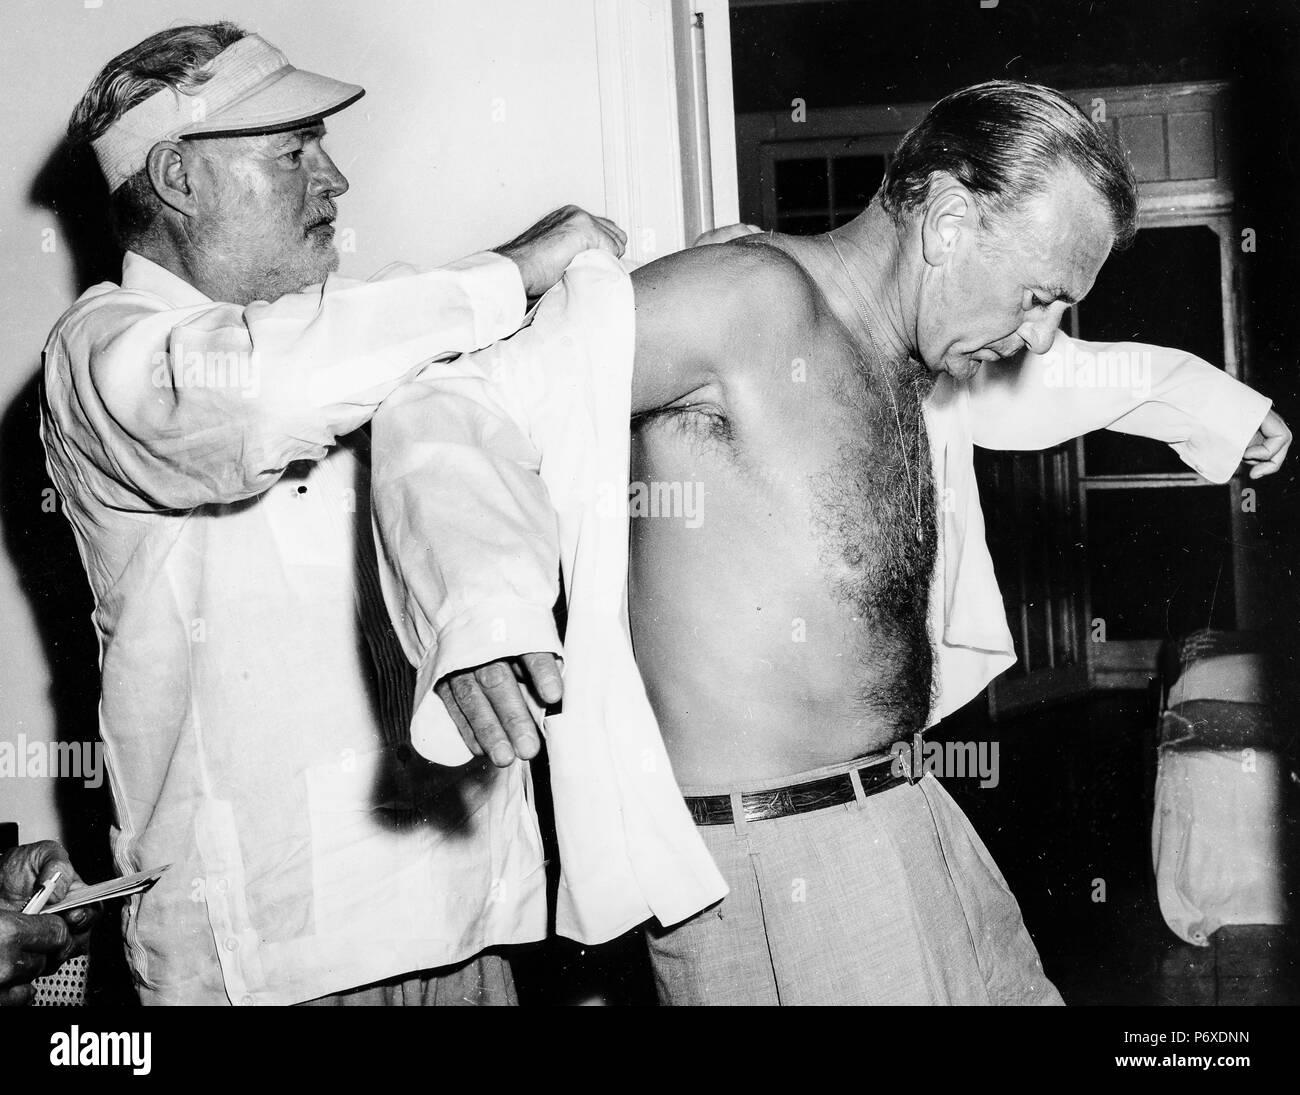 ernest hemingway, gary cooper, havana, cuba, 1956 - Stock Image